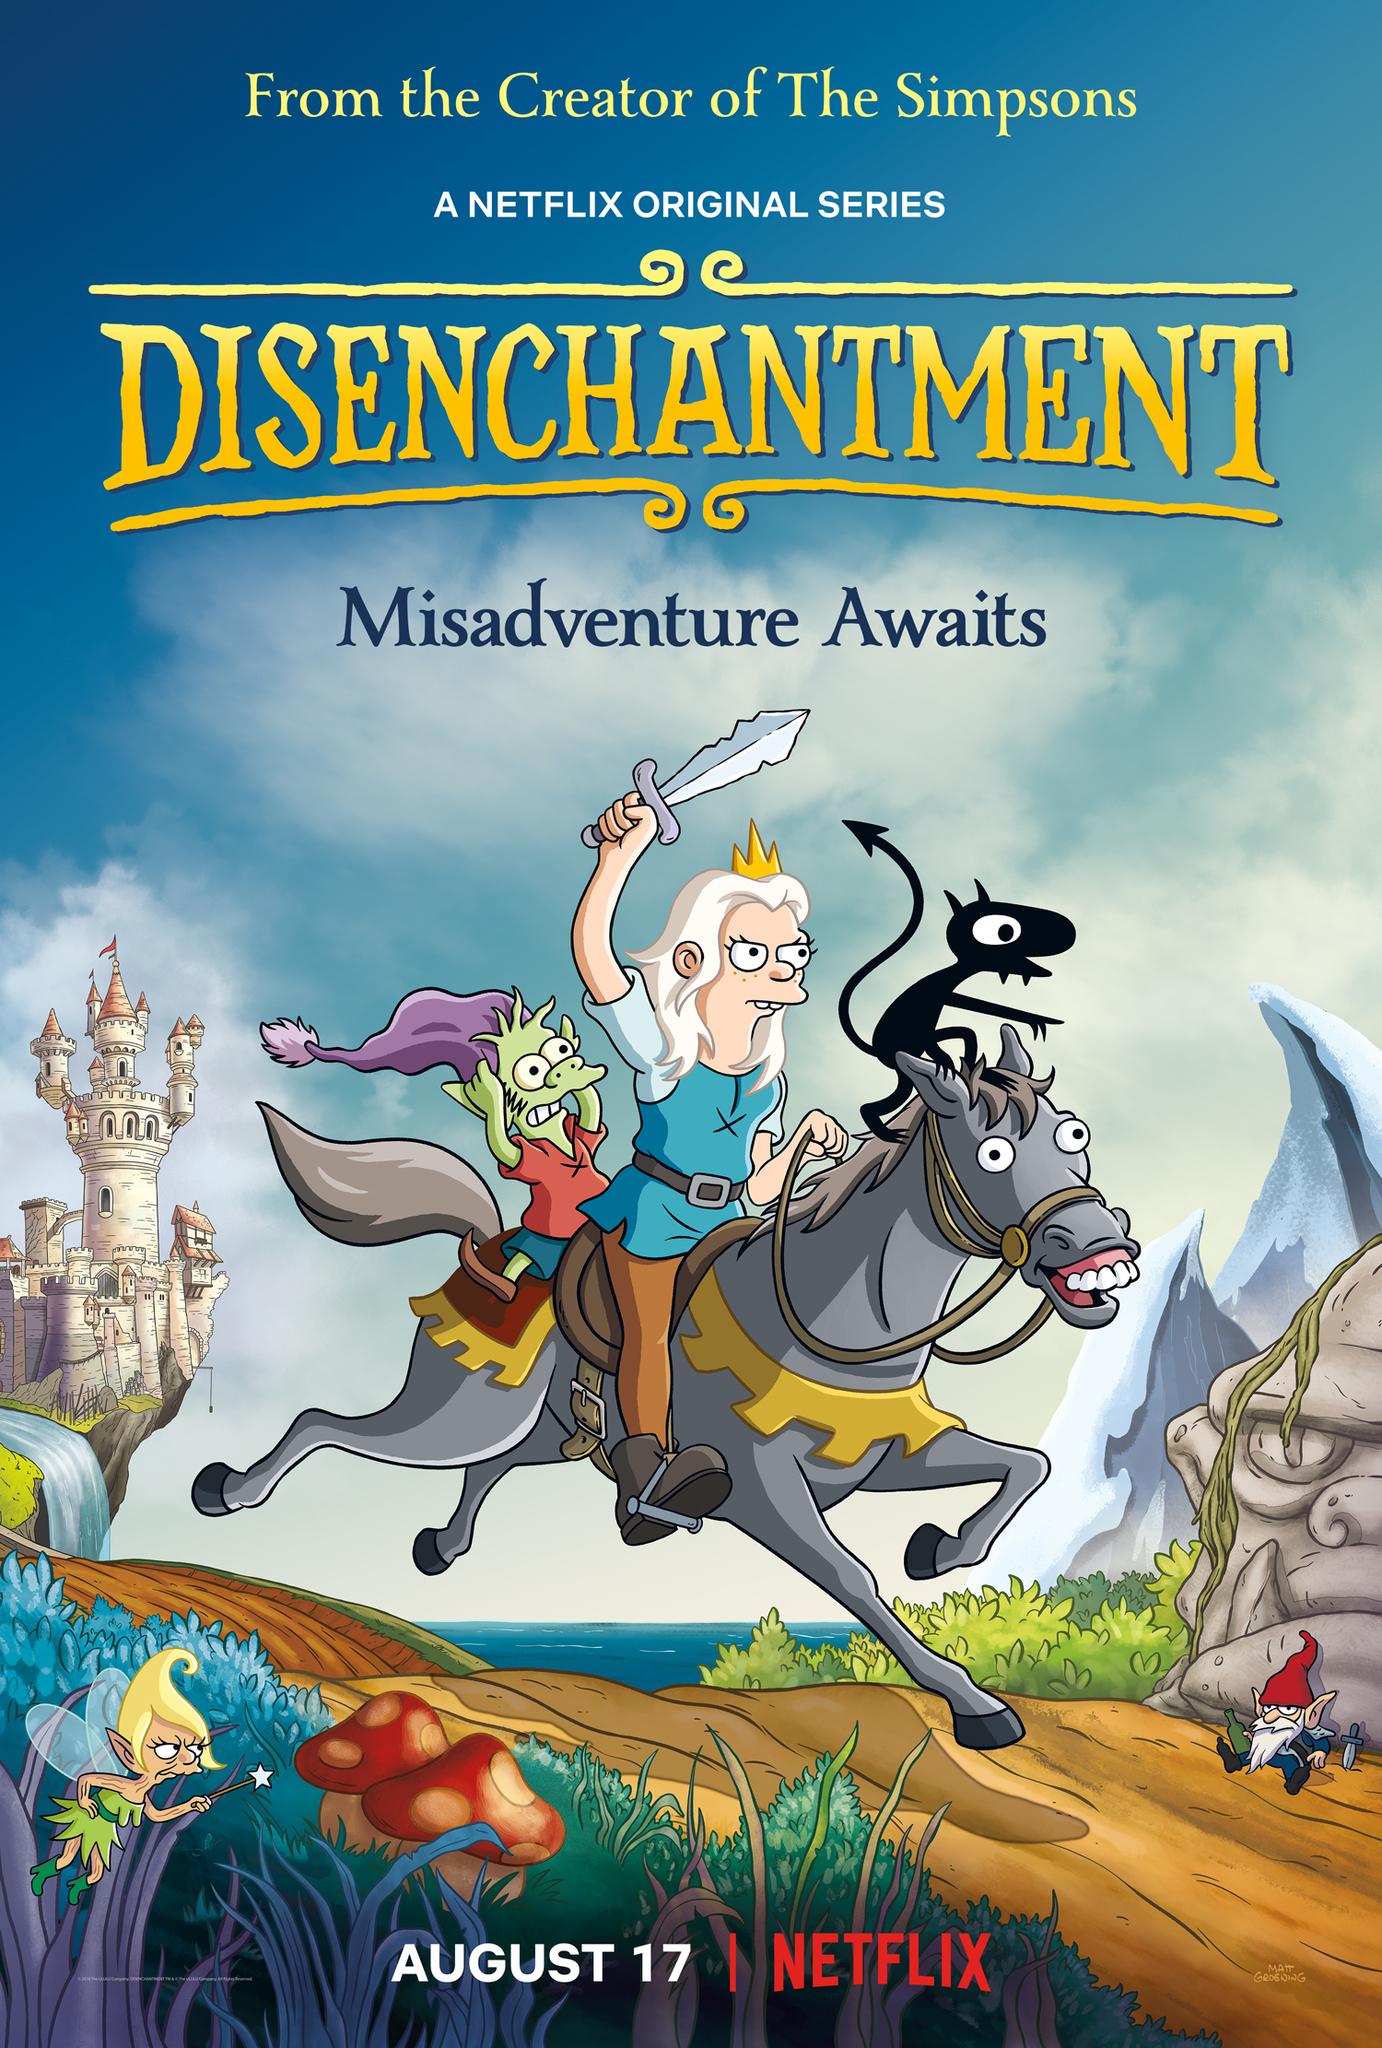 [Netflix] Disenchantment ดิสเอนแชนท์เมนต์ เอลฟ์แสบกับเจ้าหญิงสำมะเล ภาค1 ตอนที่ 1-10 ซับไทย